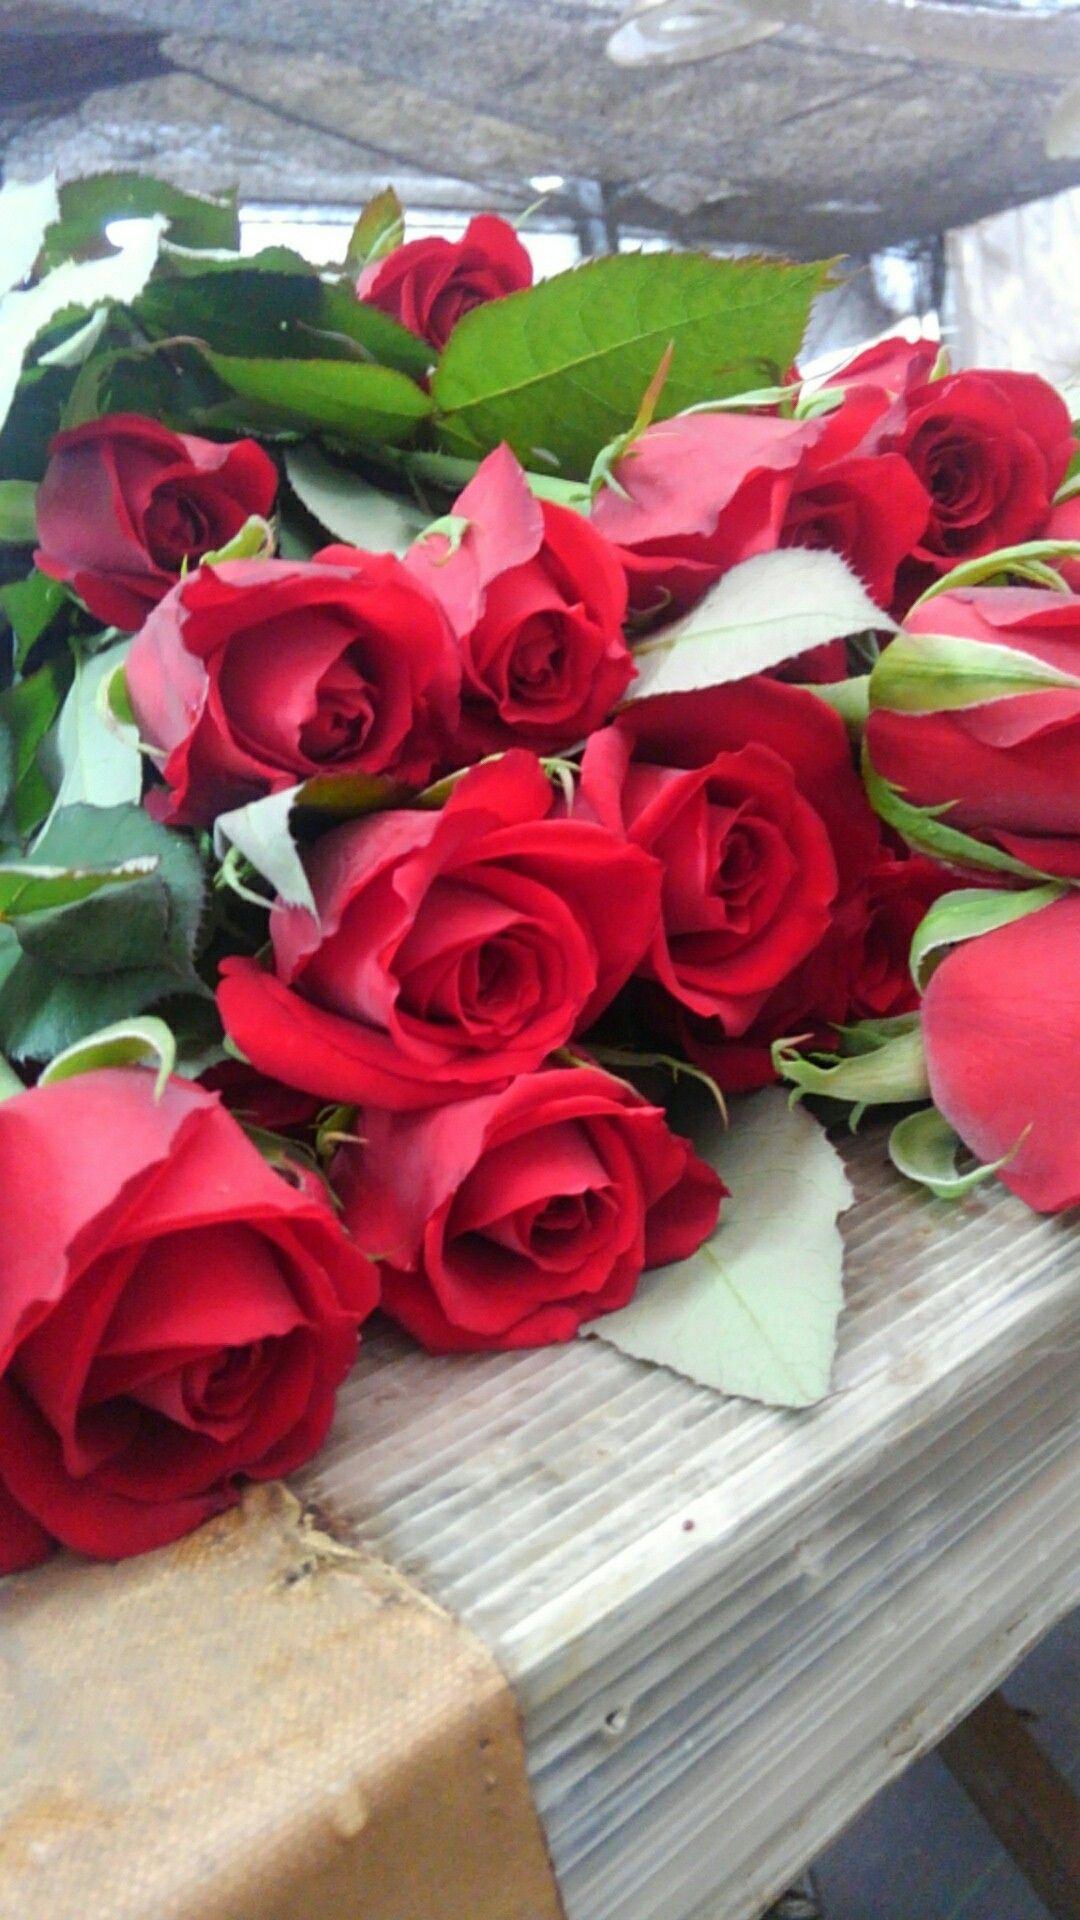 i¼—i¼˜a'µaƒ aƒa'¤ roses flowers red roses rose bouquet